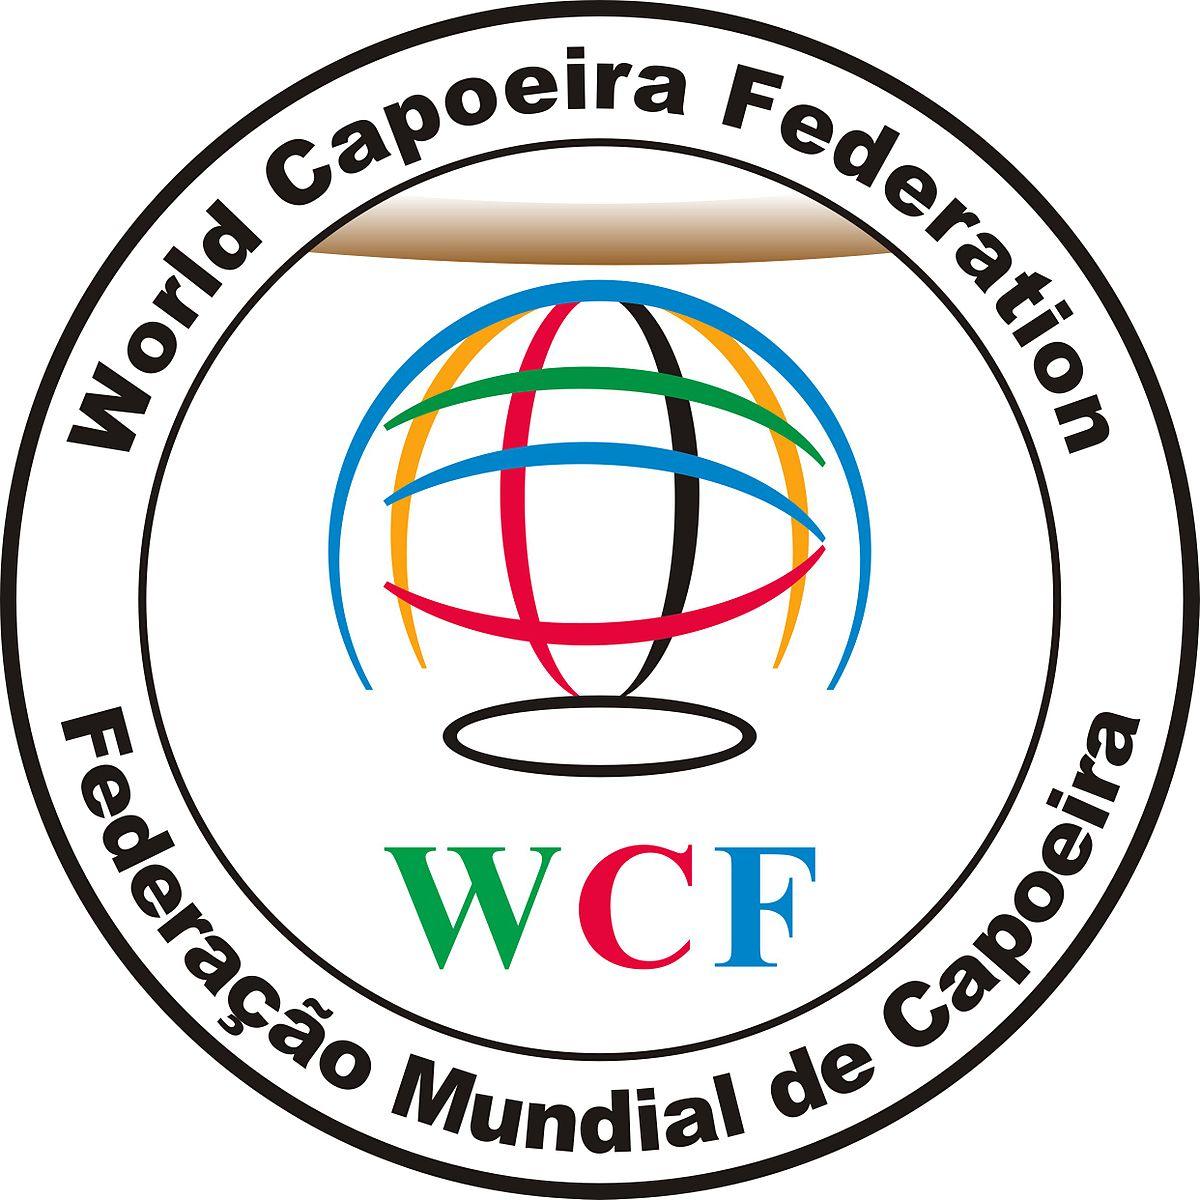 world capoeira federation